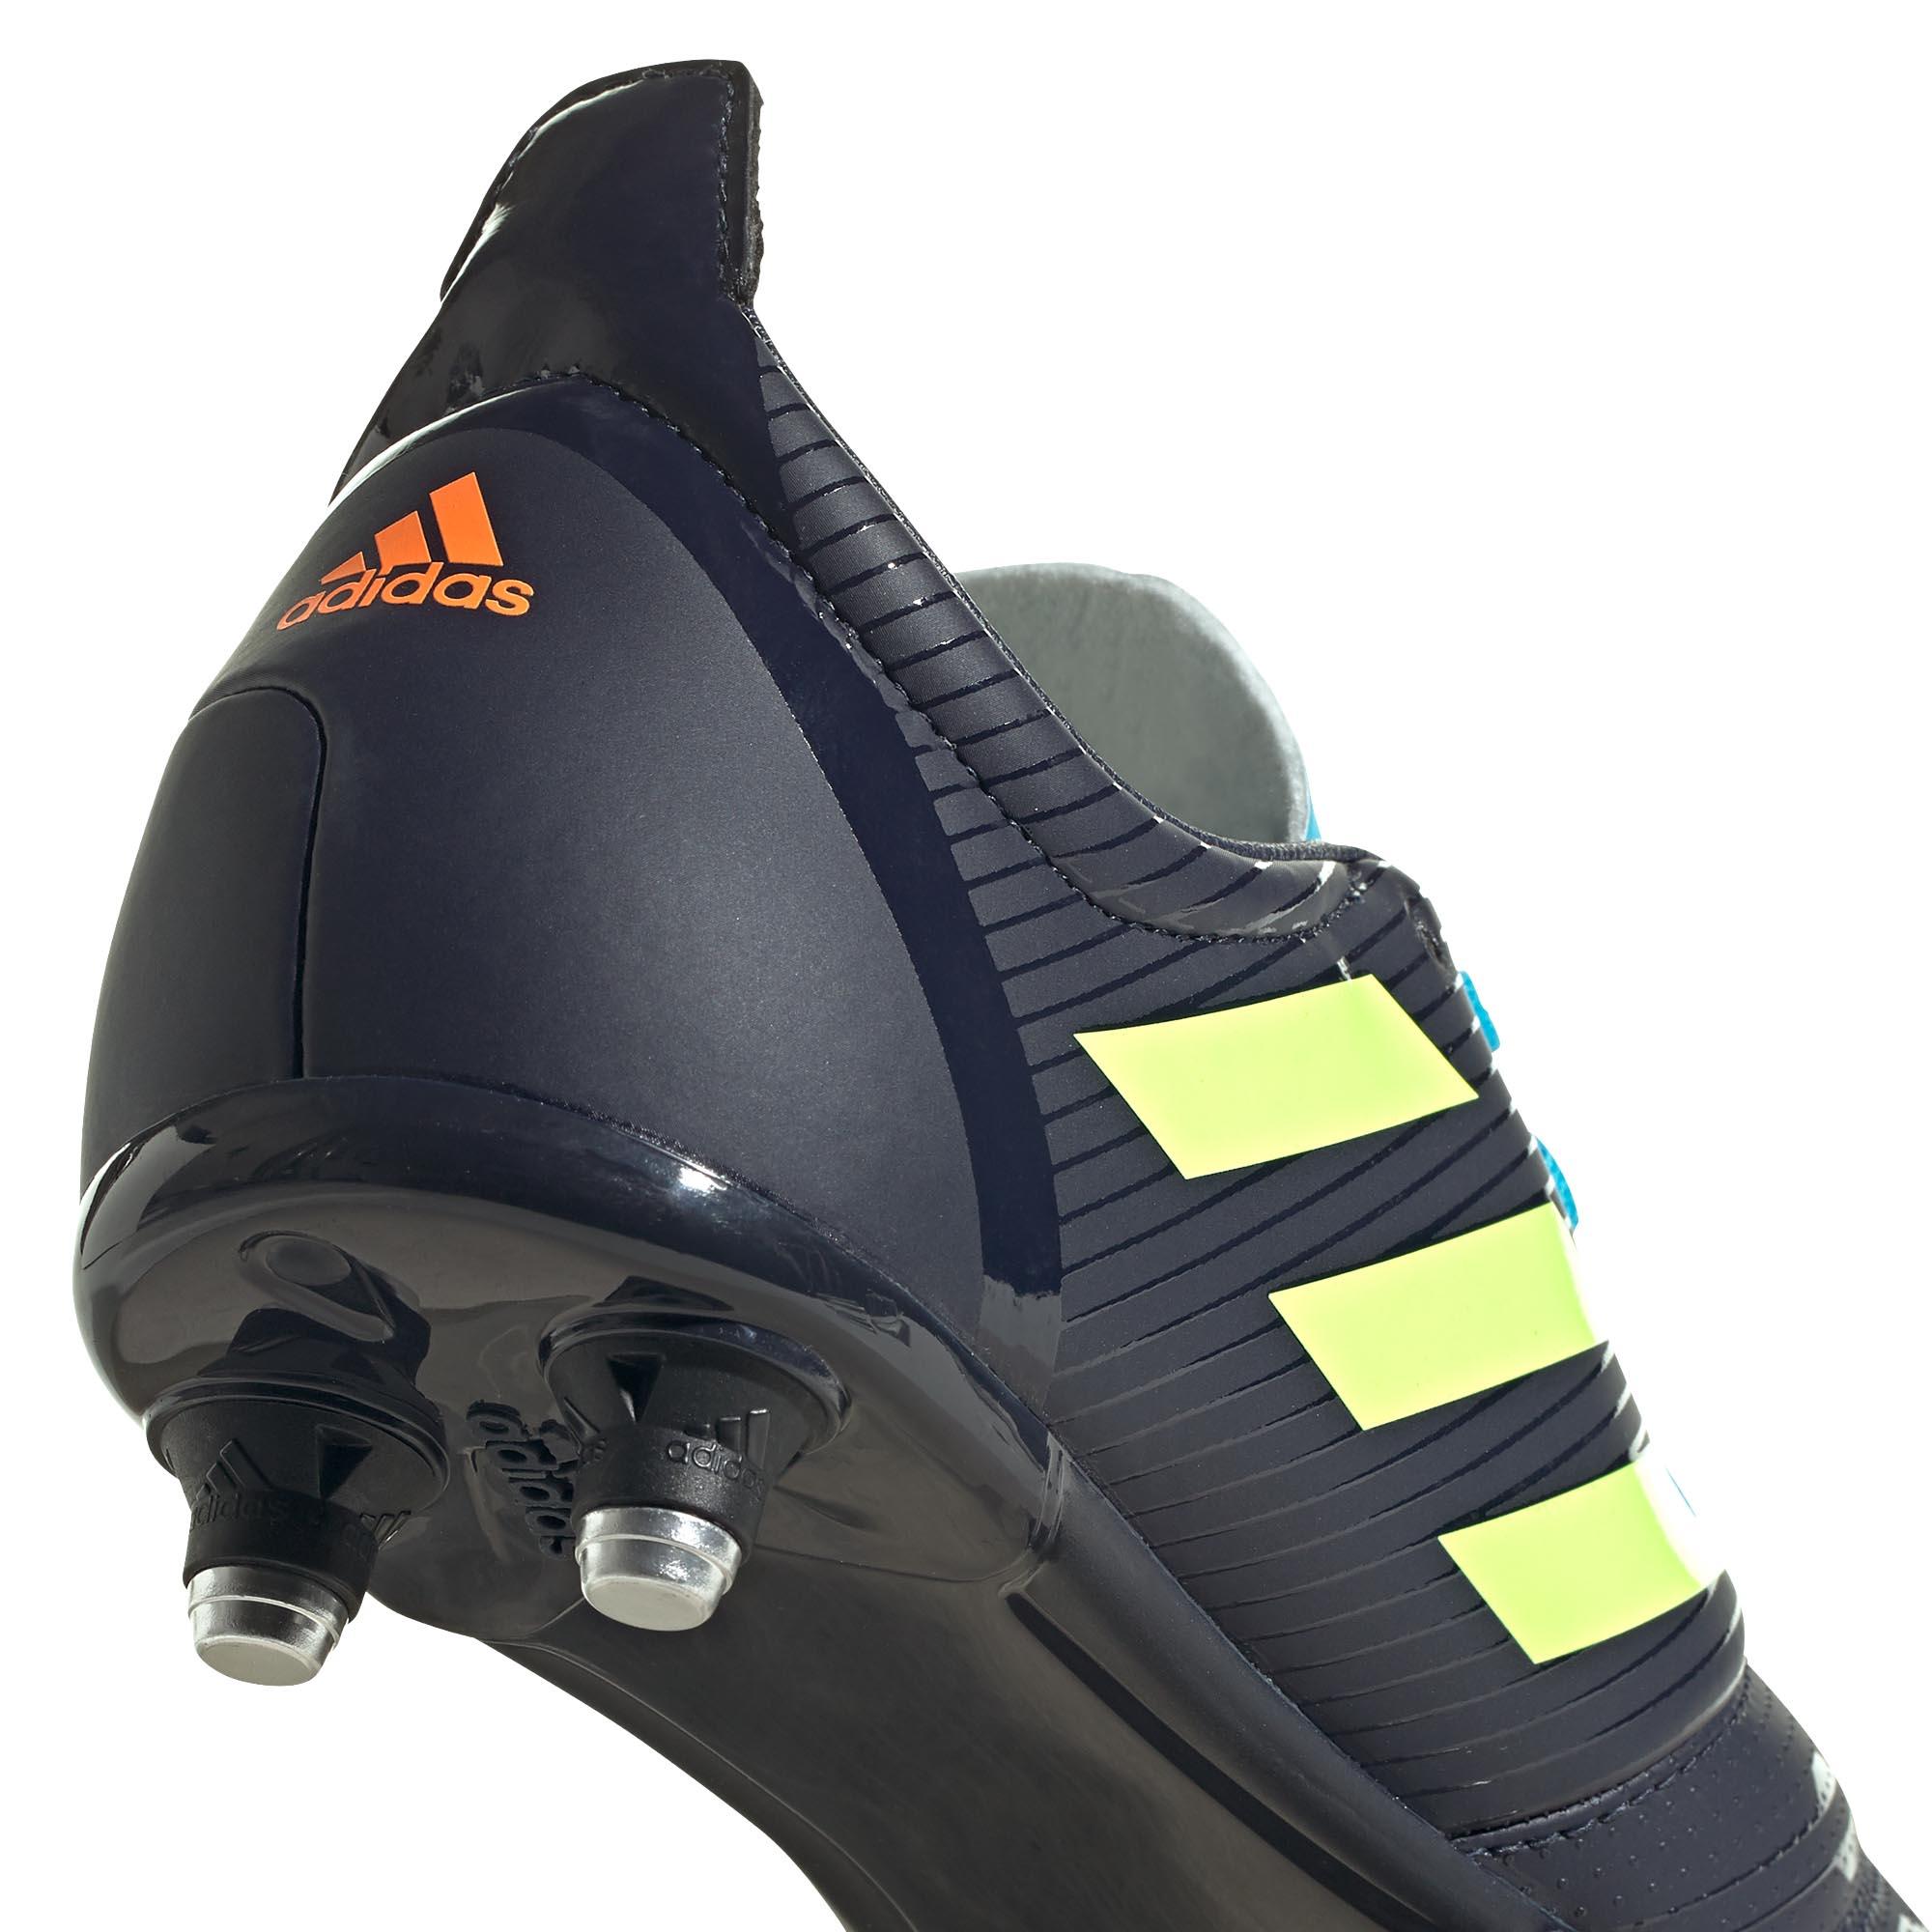 miniature 10 - Adidas Malice SG Terrain Souple Junior Enfants Rugby Bottes Bleu Marine/Vert